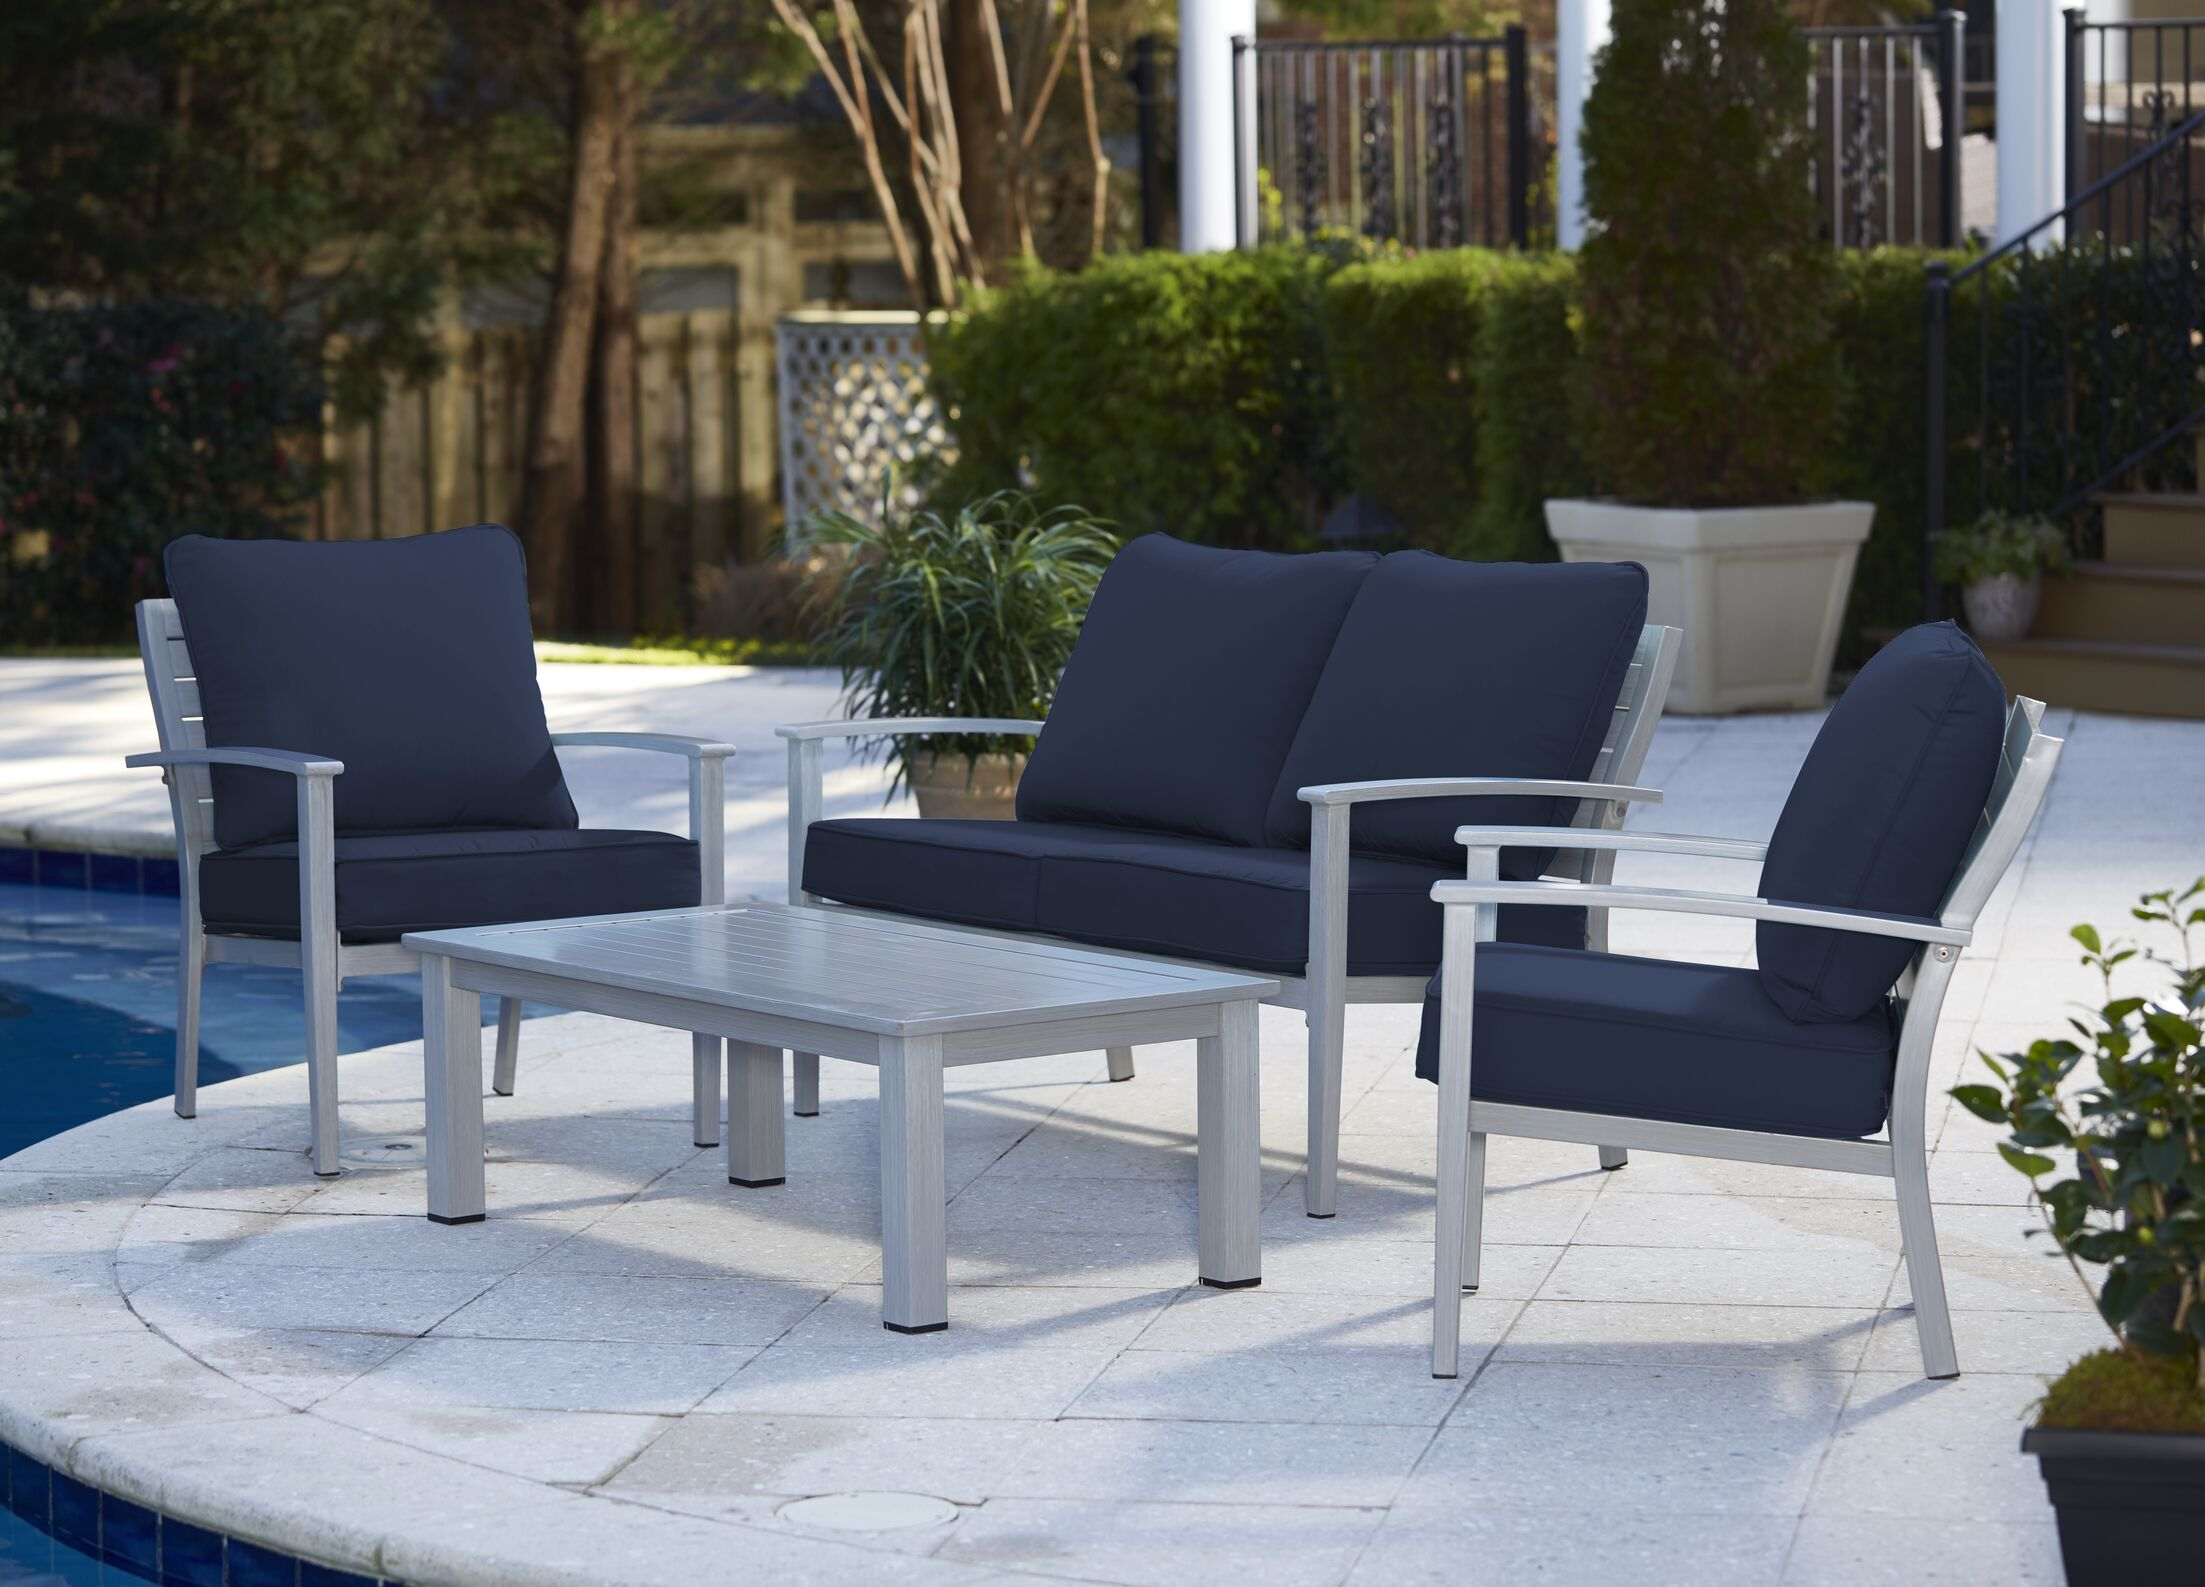 Yohan 4 Piece Sofa Set with Cushions Color: Gray/Navy